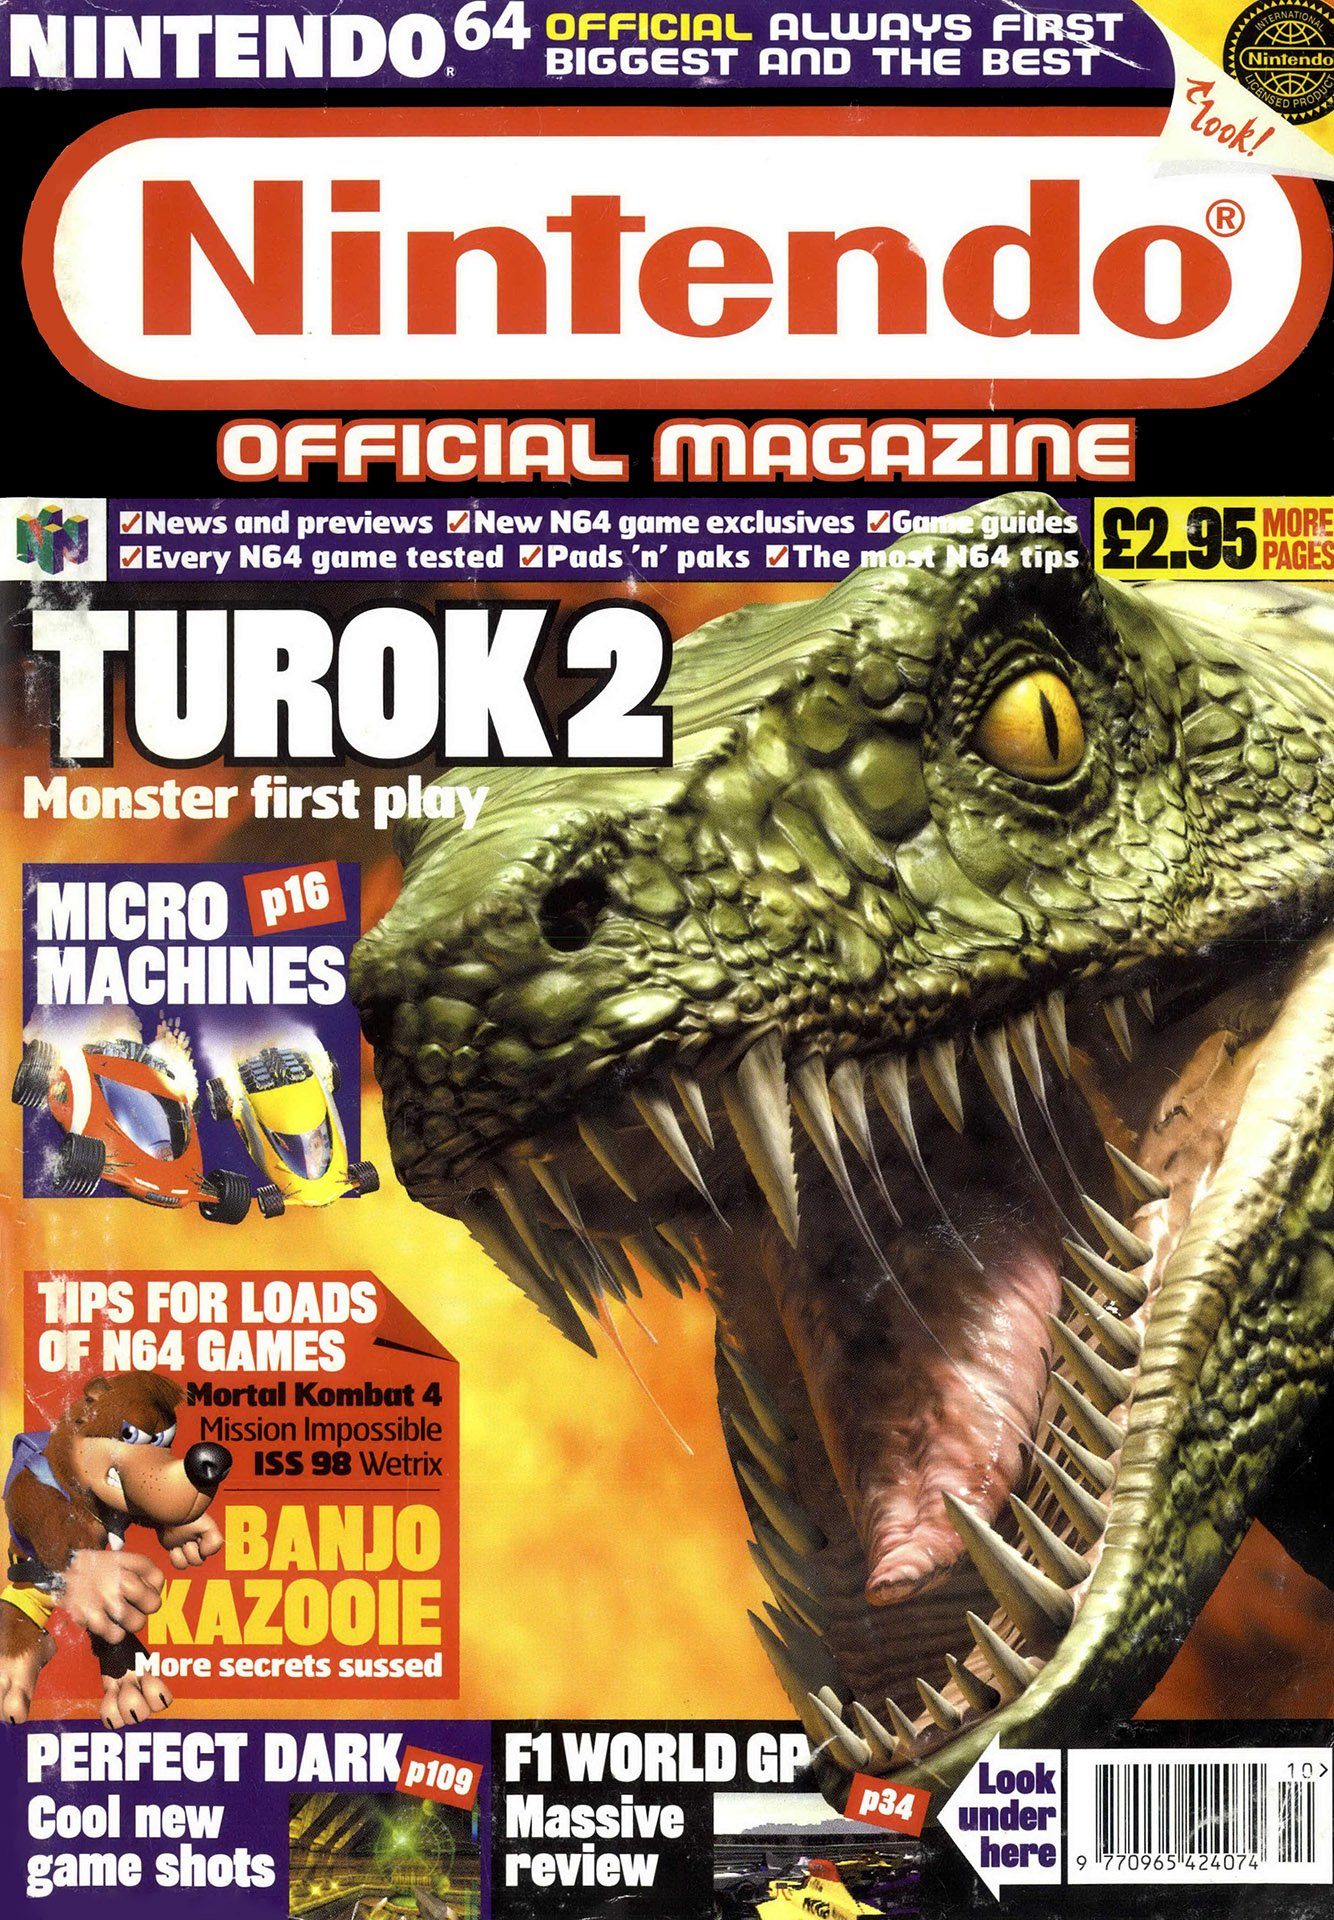 Nintendo Official Magazine 073 (October 1998)